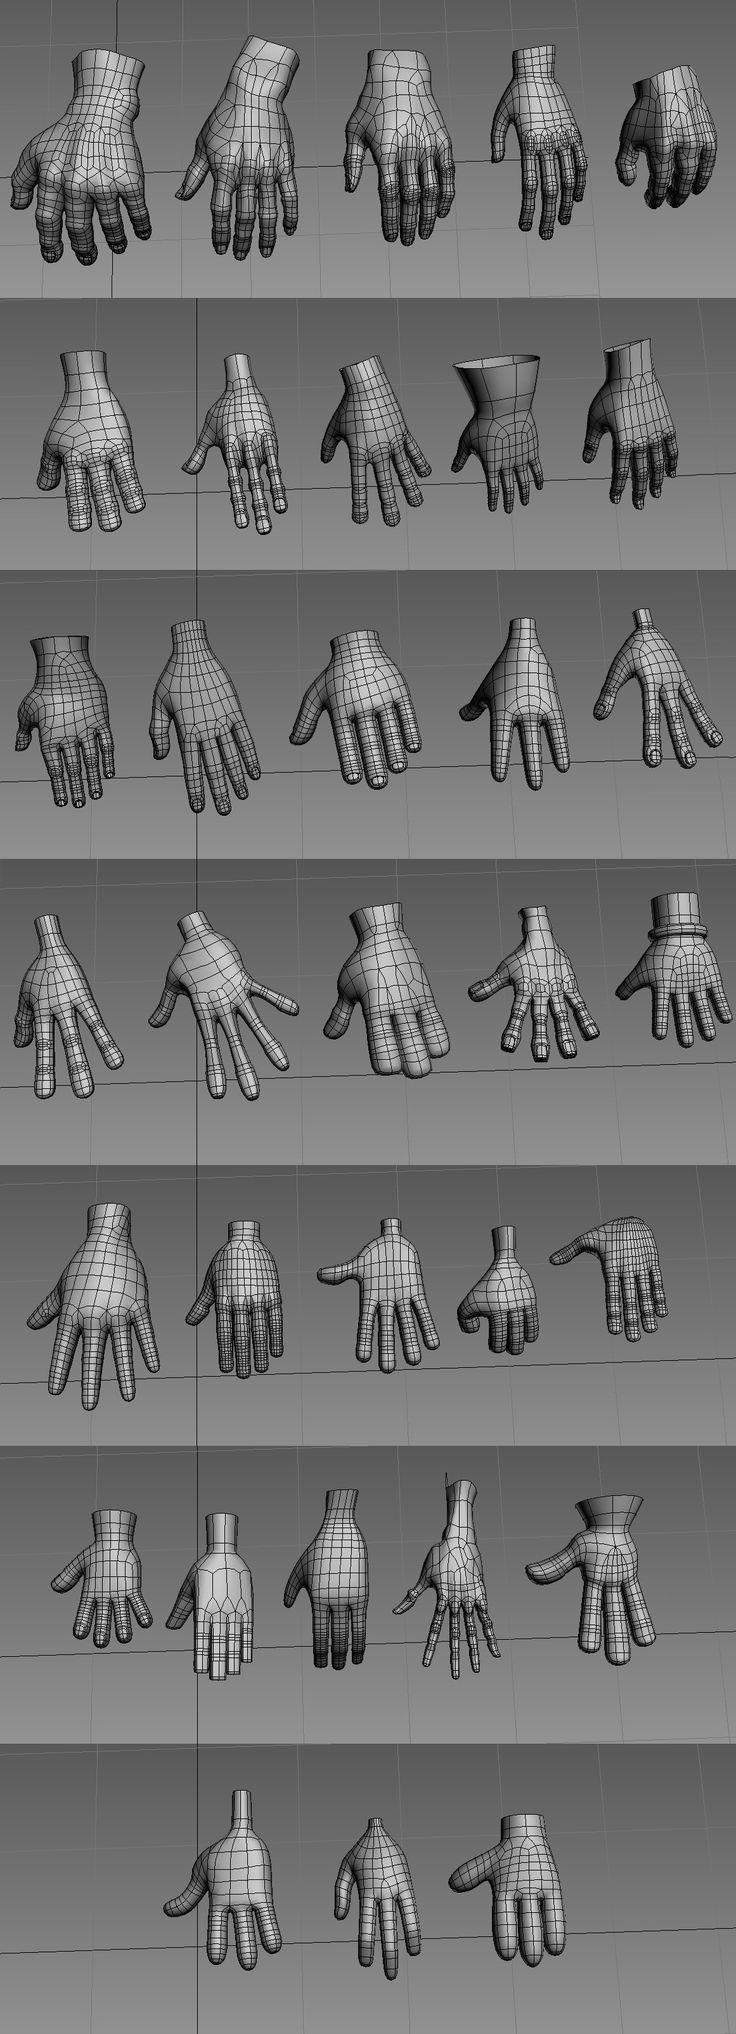 Hand topology